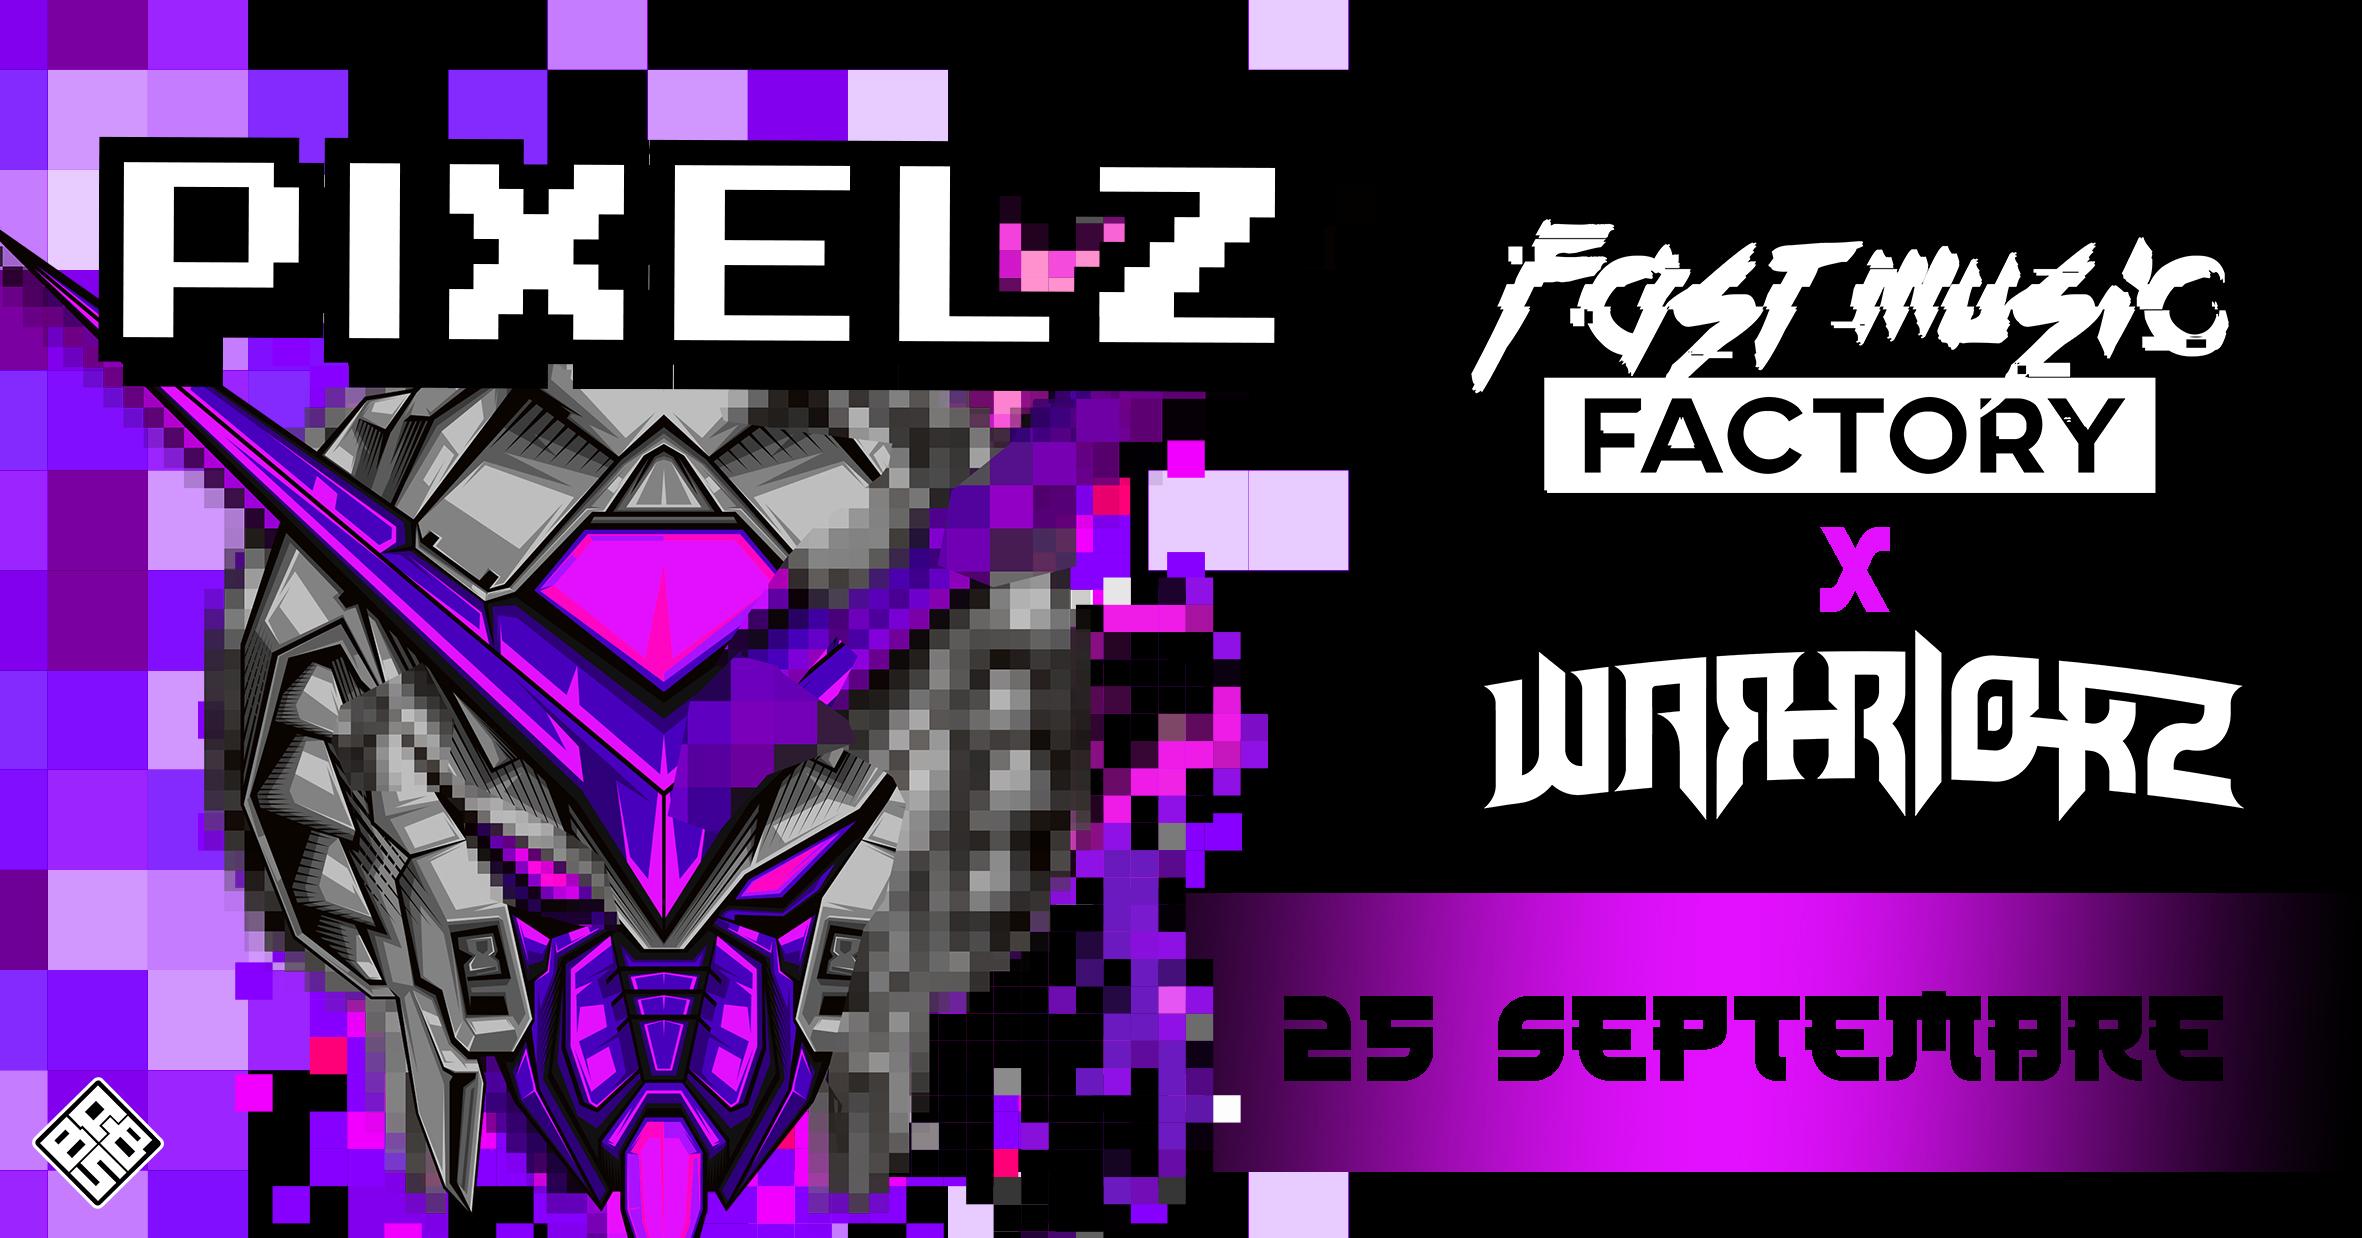 PIXELZ (Fast Music Factory x Warriorz)